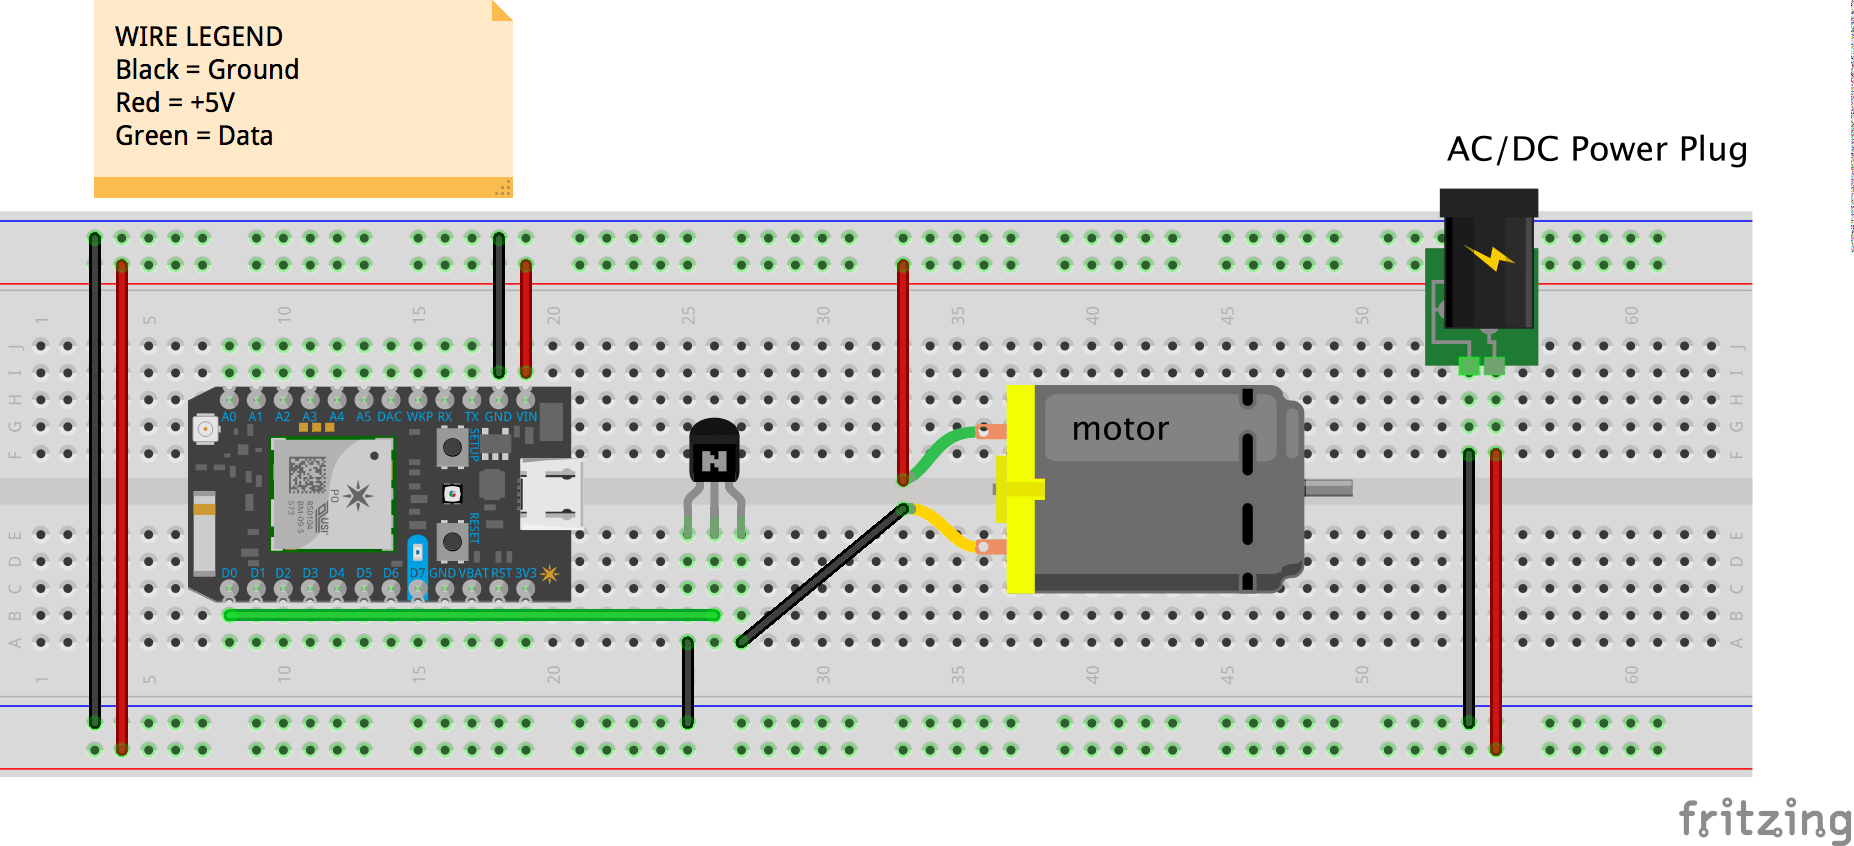 Diy Led Bubble Tube Part 5motor Control Morphatic Dc Power Plug Wiring Diagram Breadboard For Motor